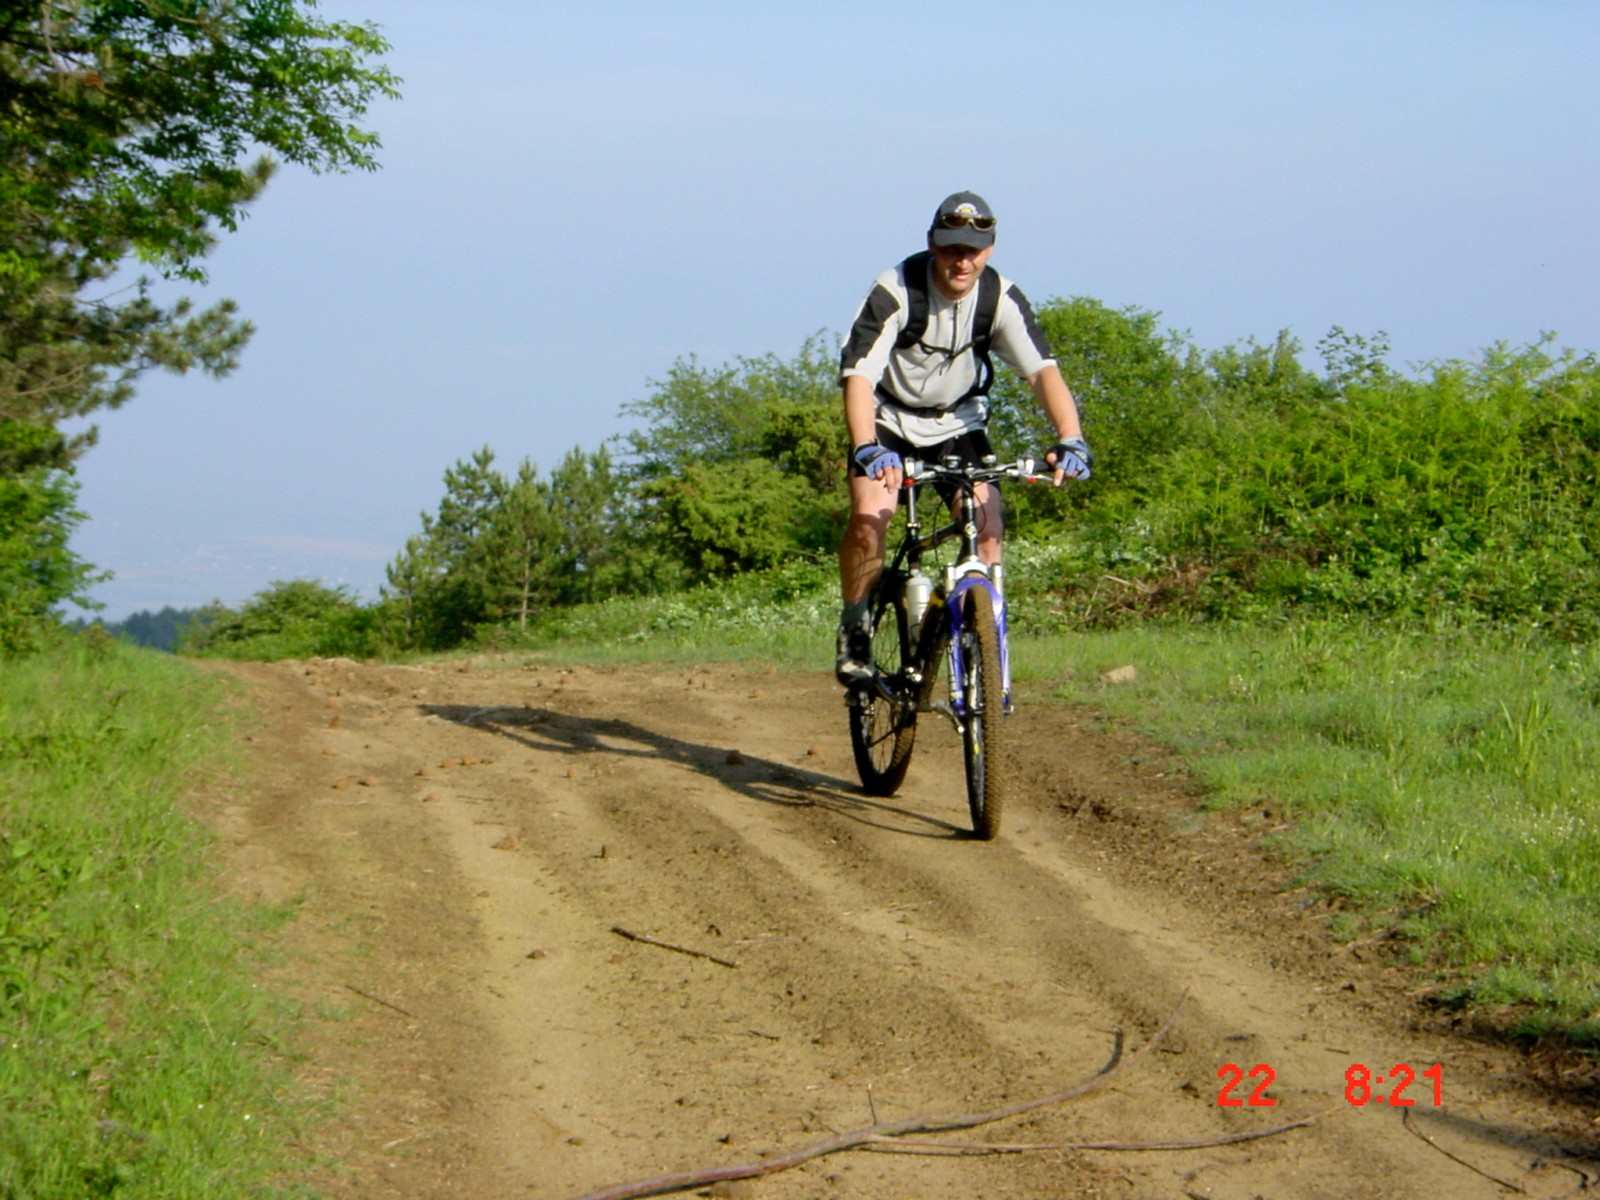 Foto: Manfred Karl / Mountainbike Tour / Monte Castel Giudeo, 1037 m / 20.06.2007 06:30:02